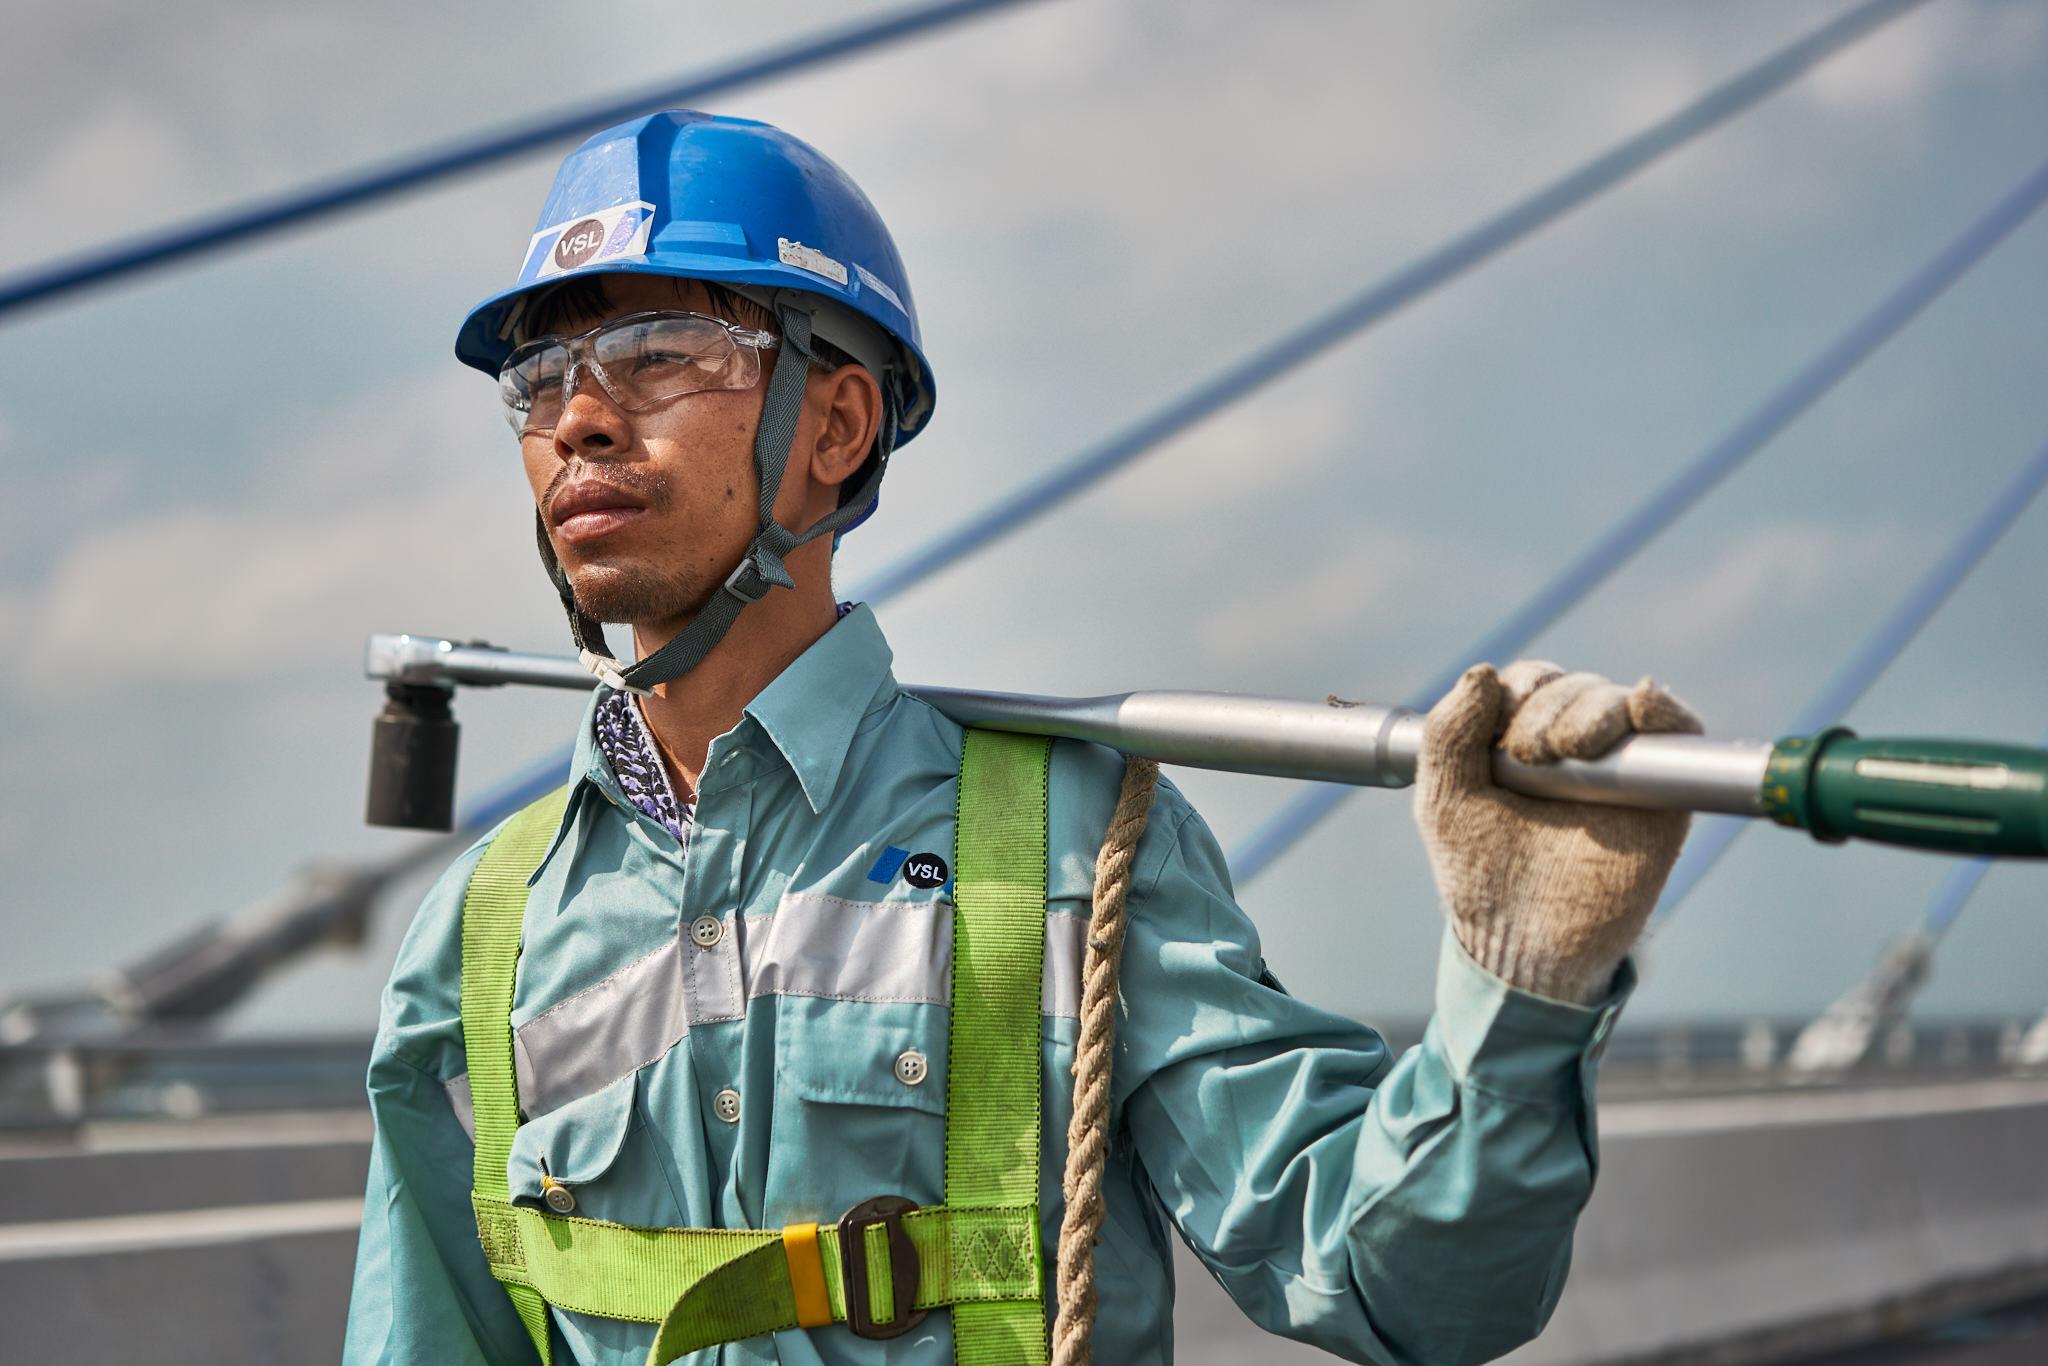 Singapore Industrial Photographer